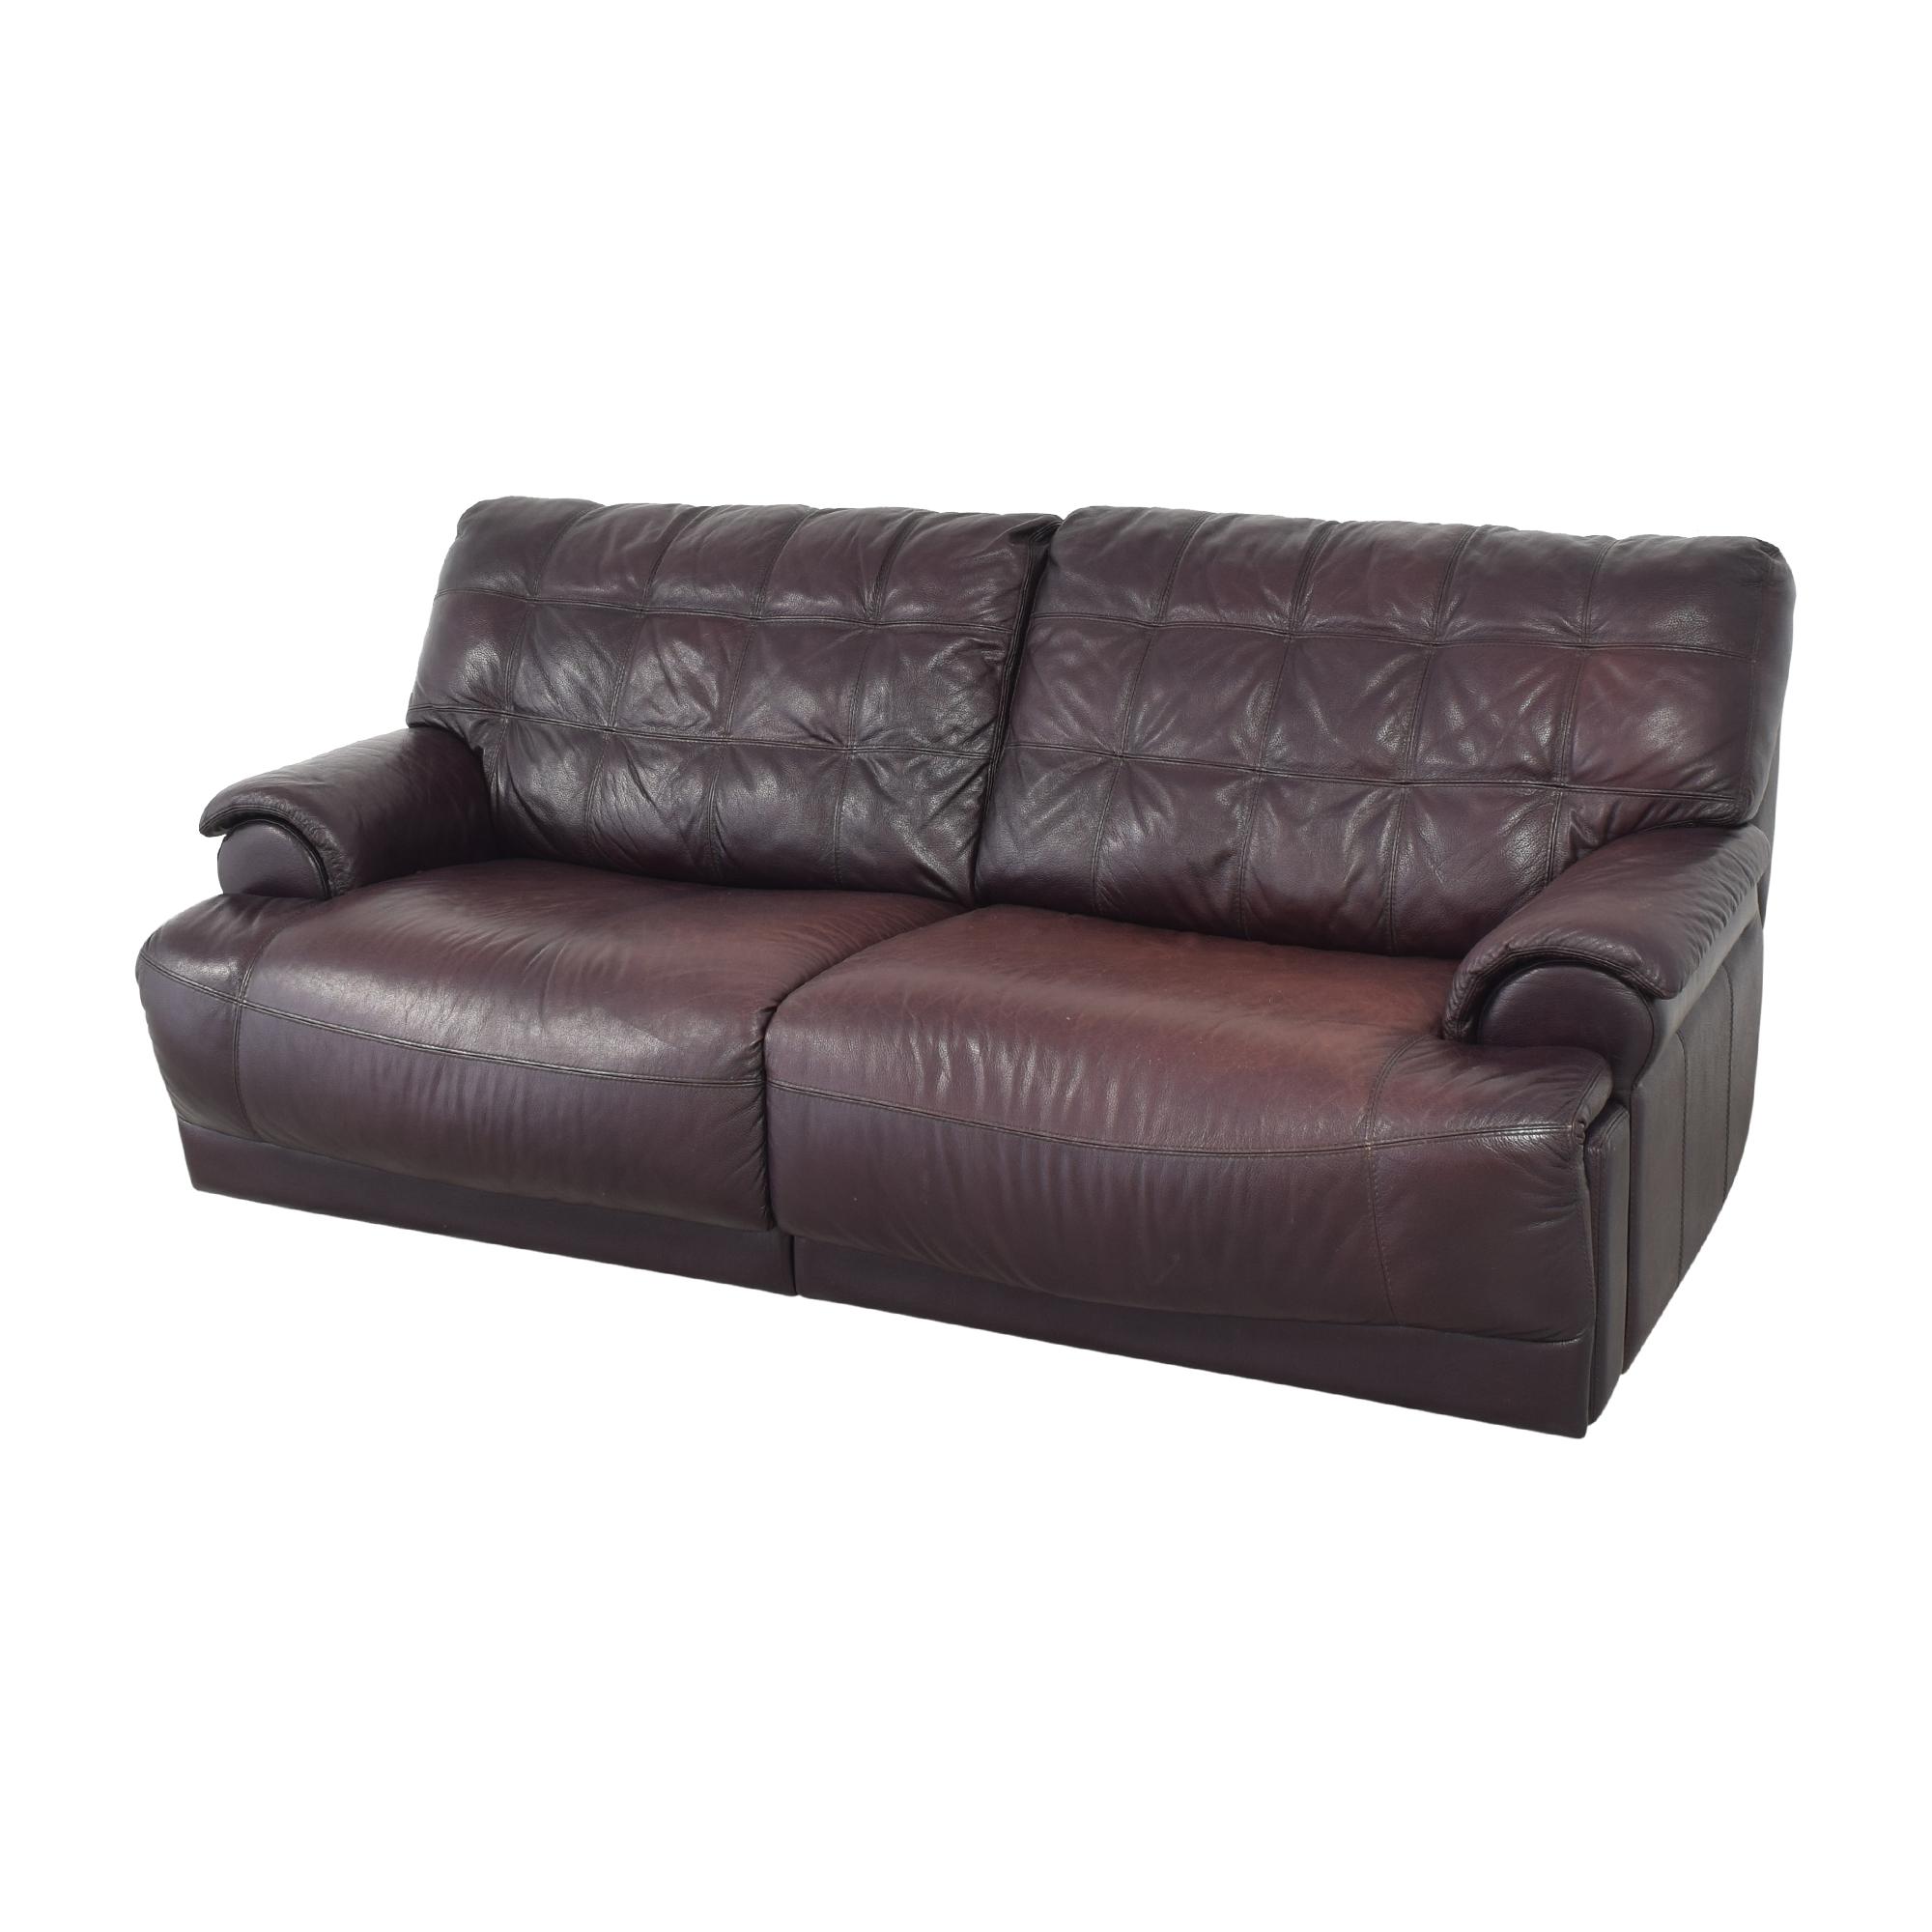 Macy's Two Cushion Reclining Sofa / Classic Sofas